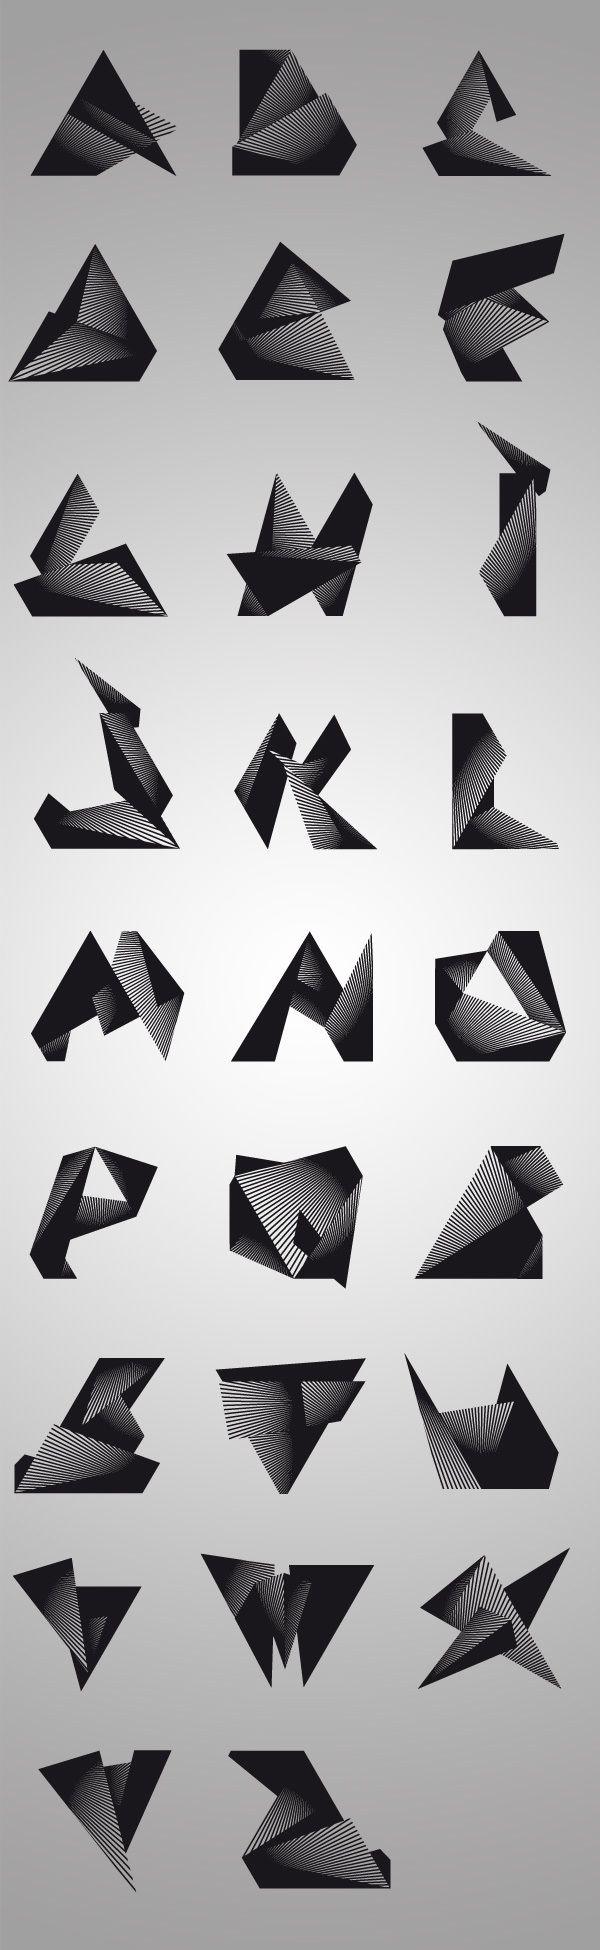 Trisec experimental typefaces